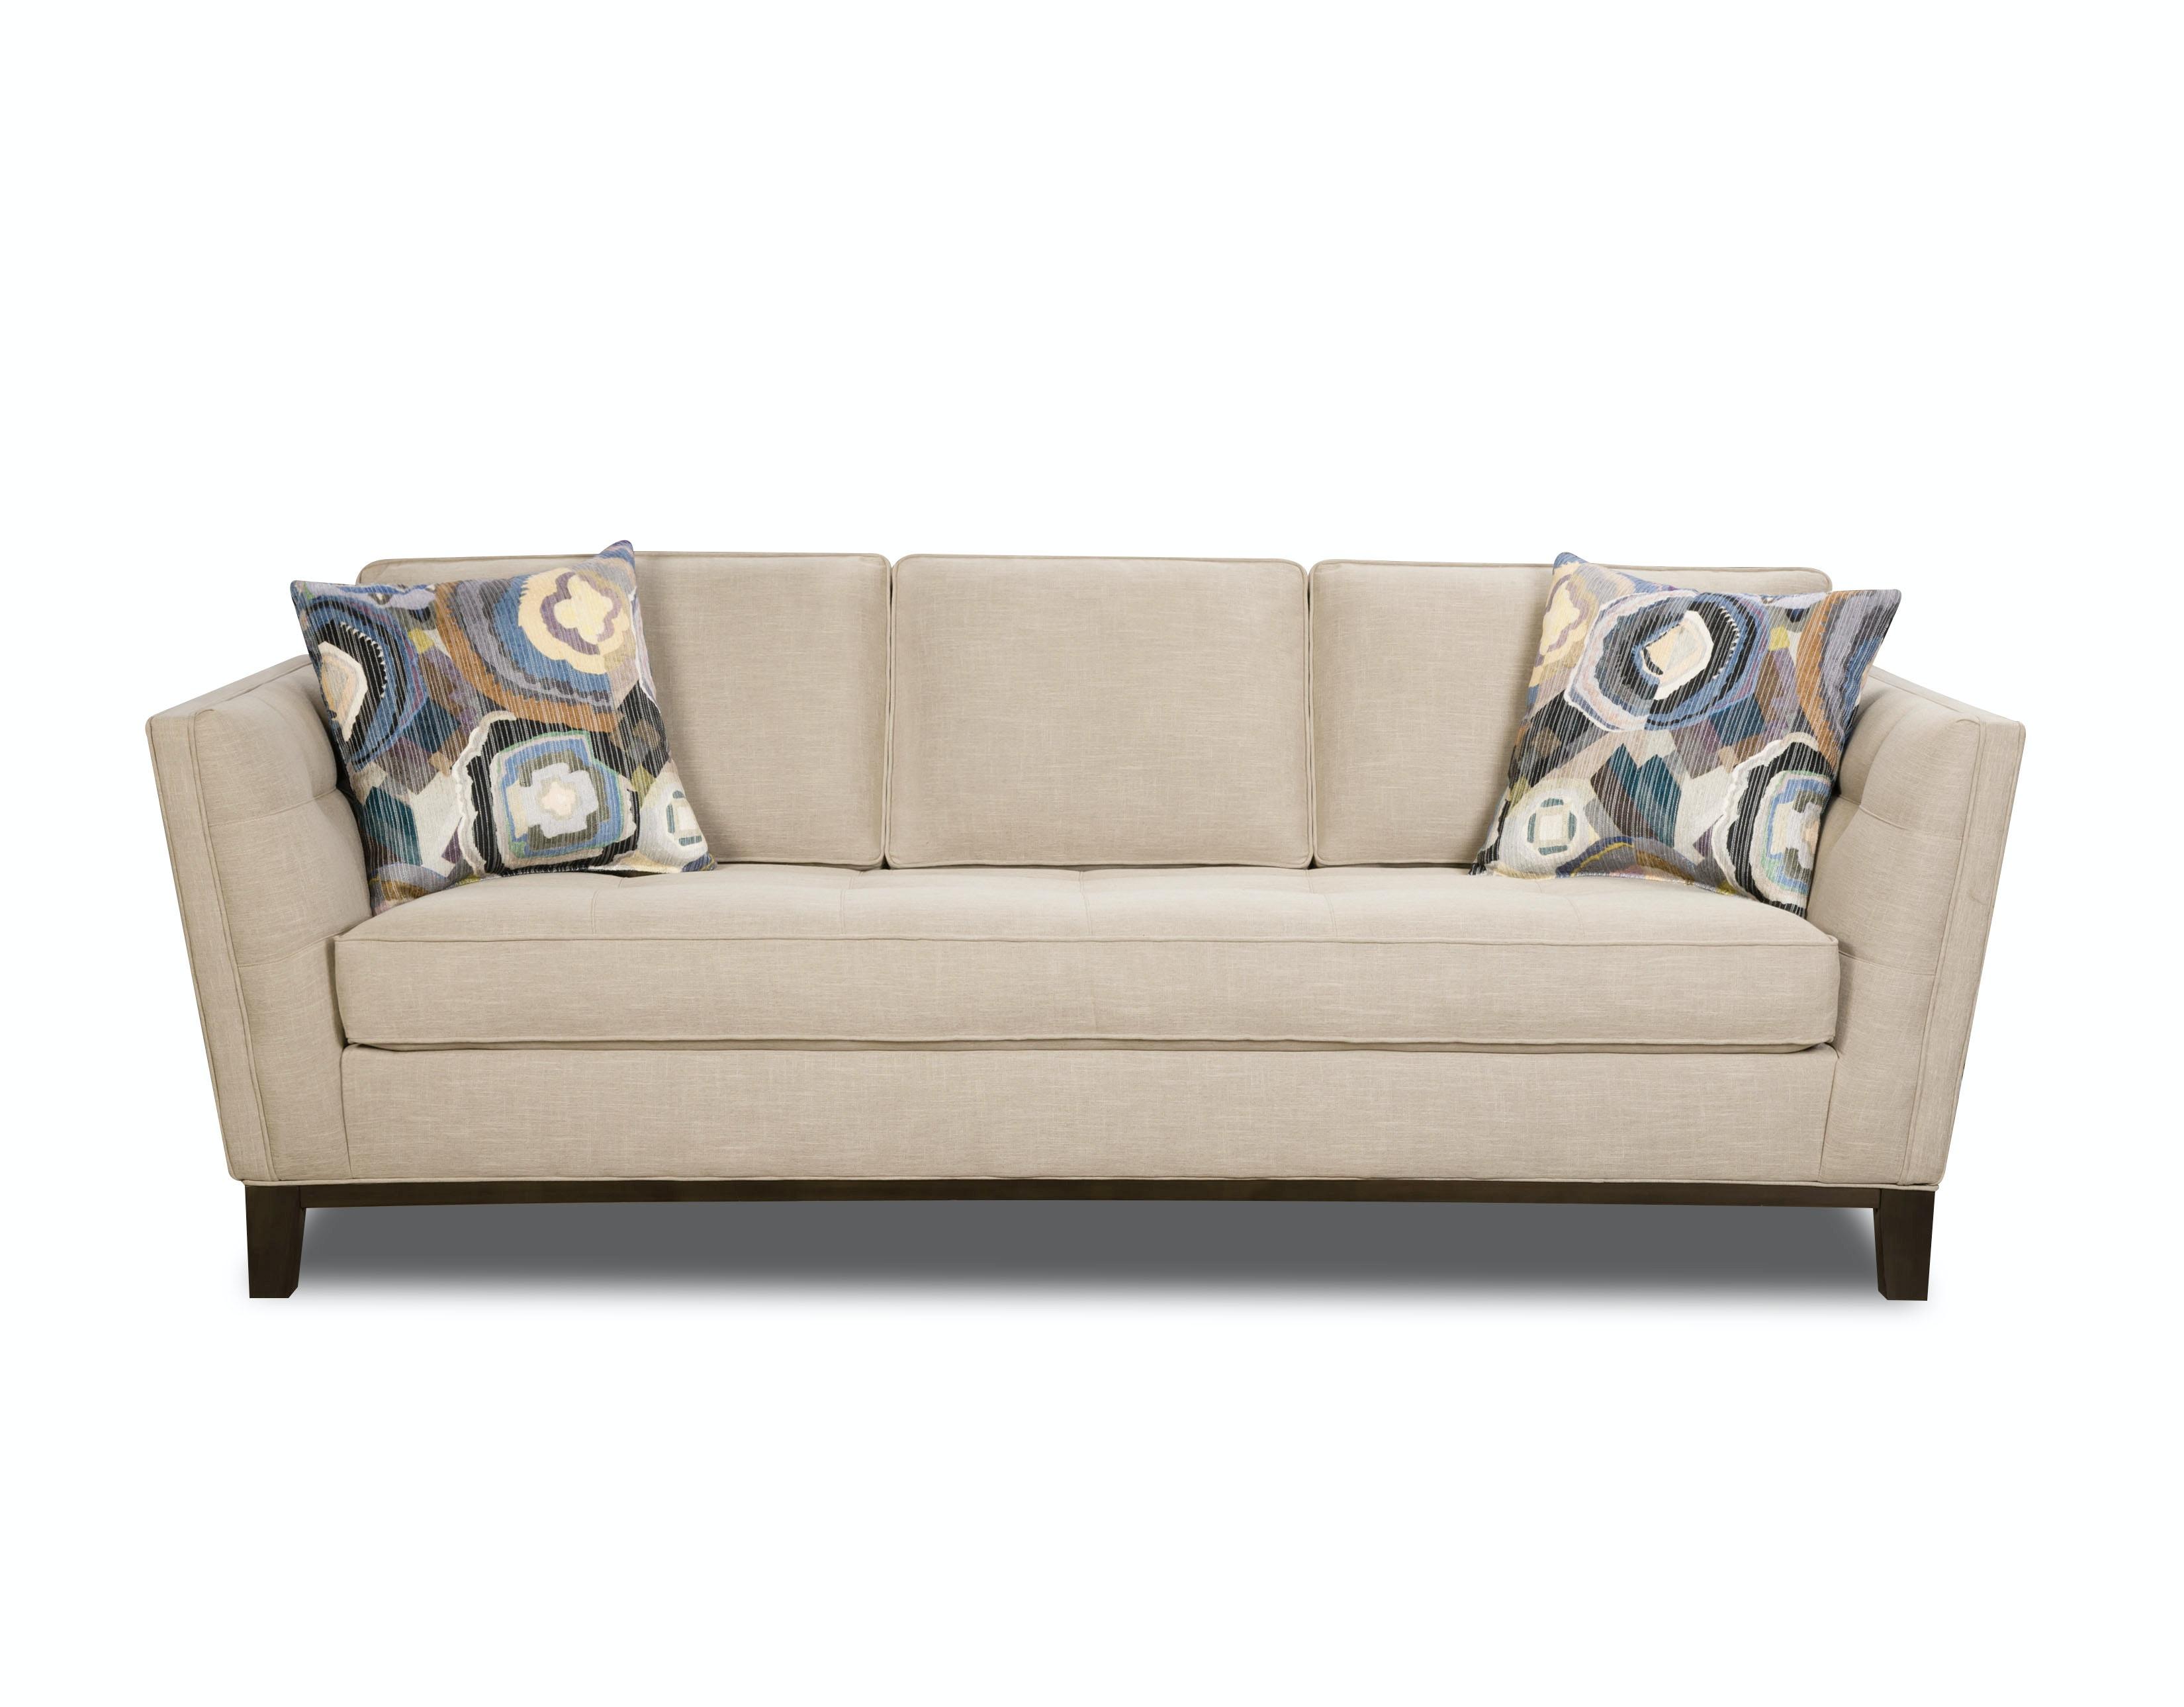 Genial Tribeca Sofa   HEMP ST:501559